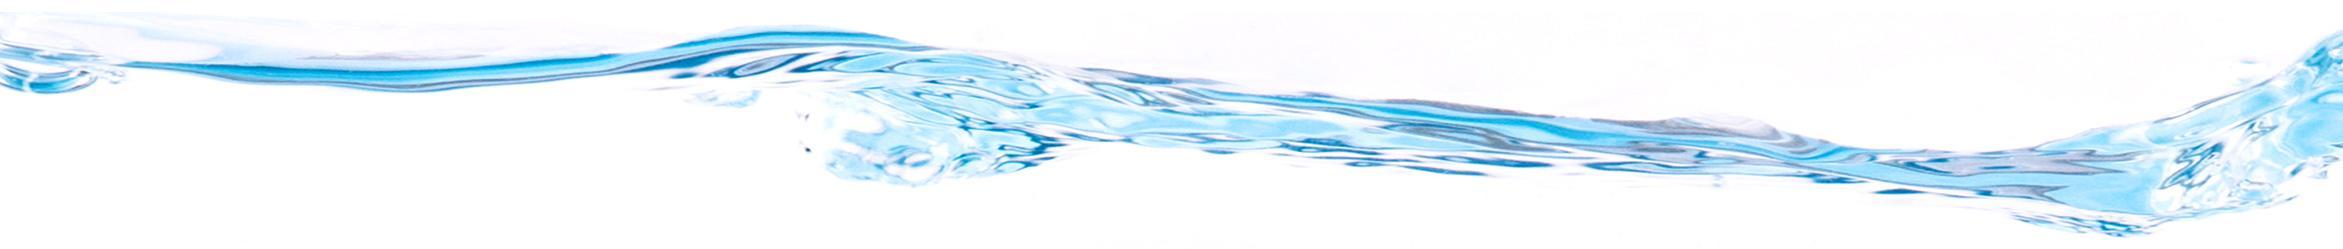 Foto met water